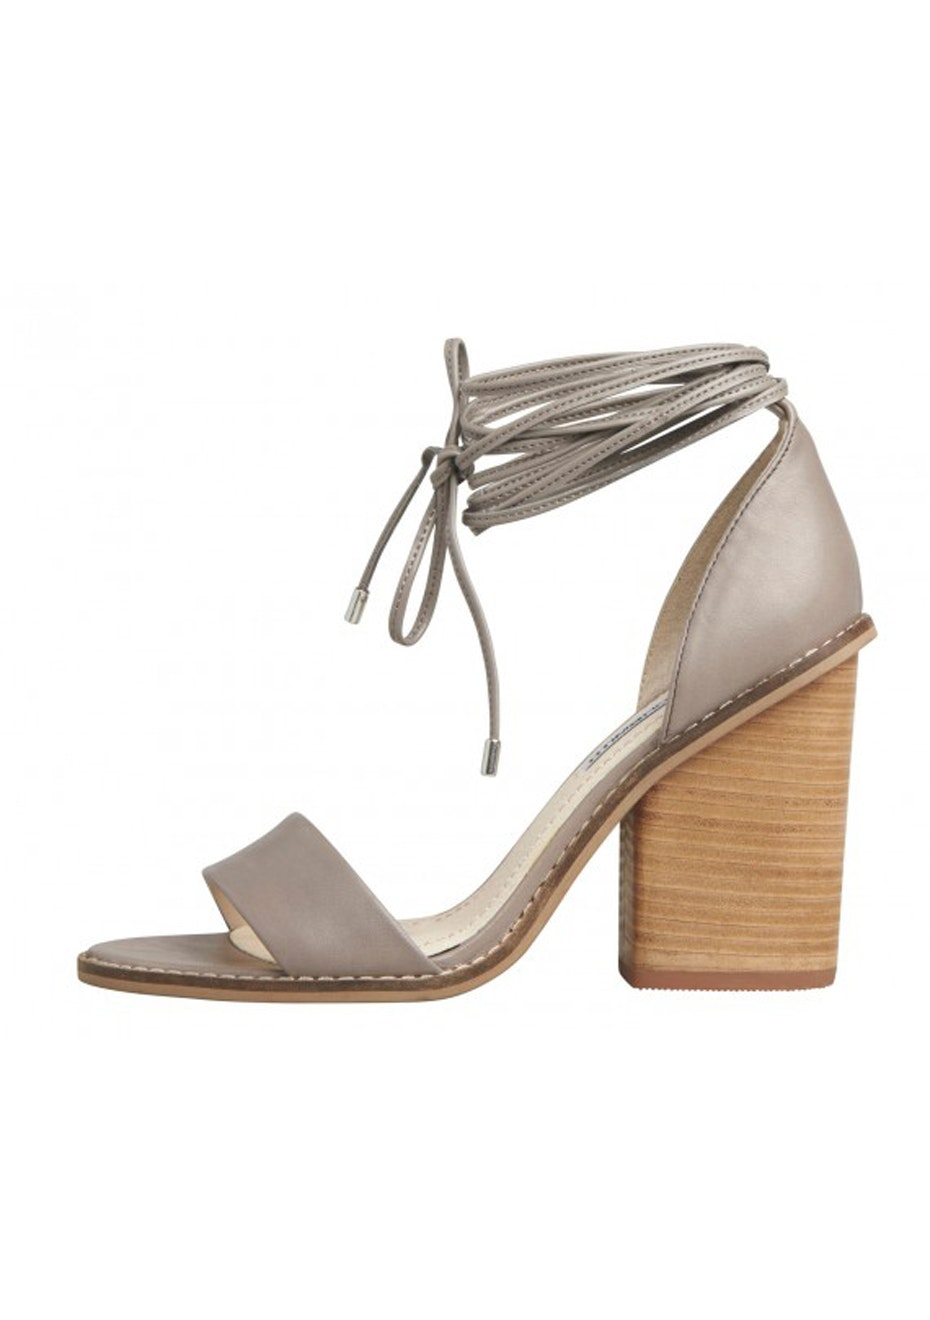 Windsor Smith - Klein - Grey Leather